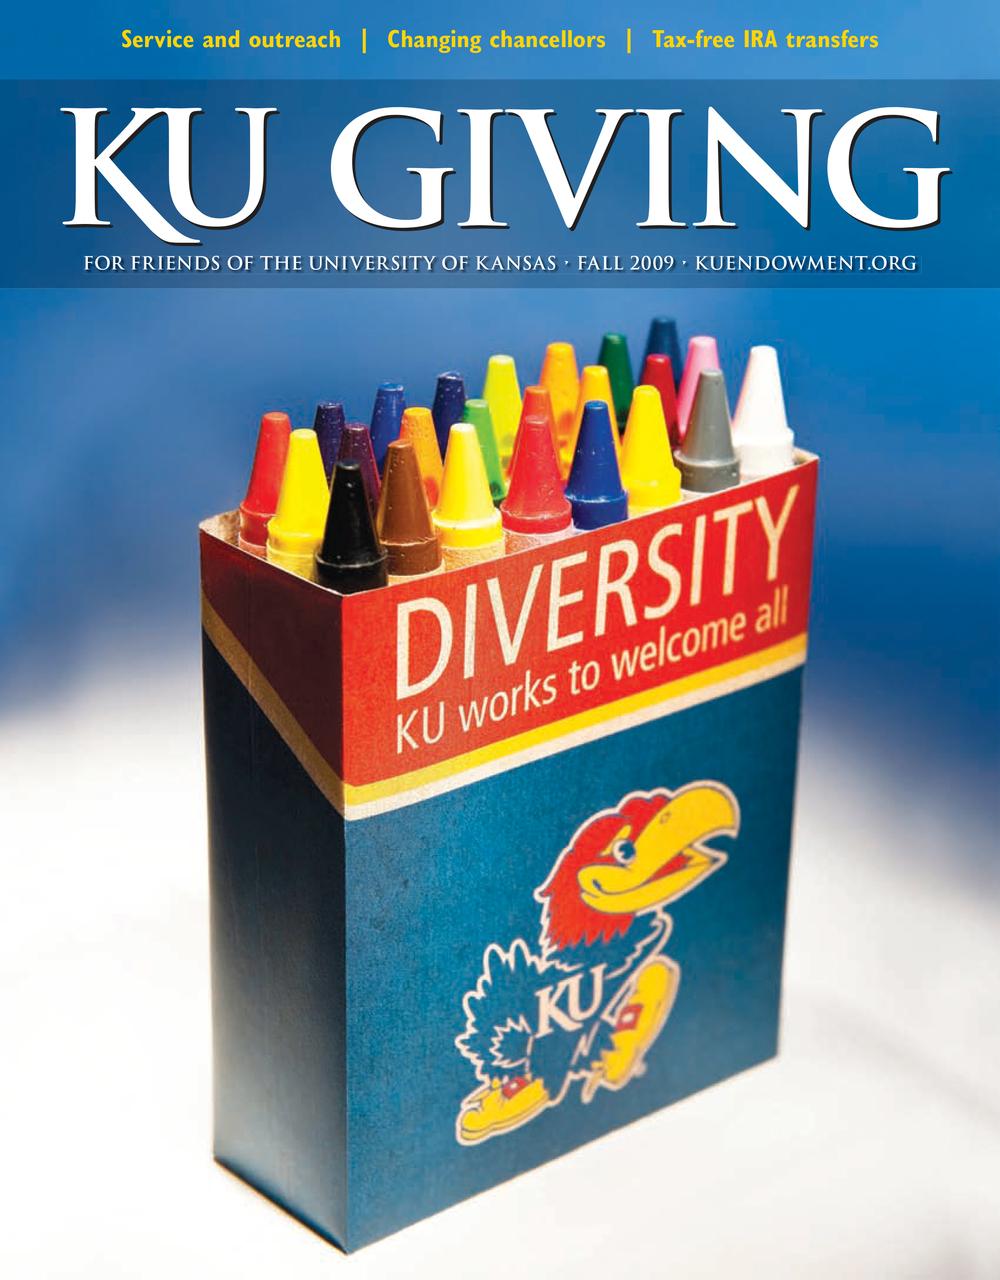 KU-Giving-cover-medium.jpg